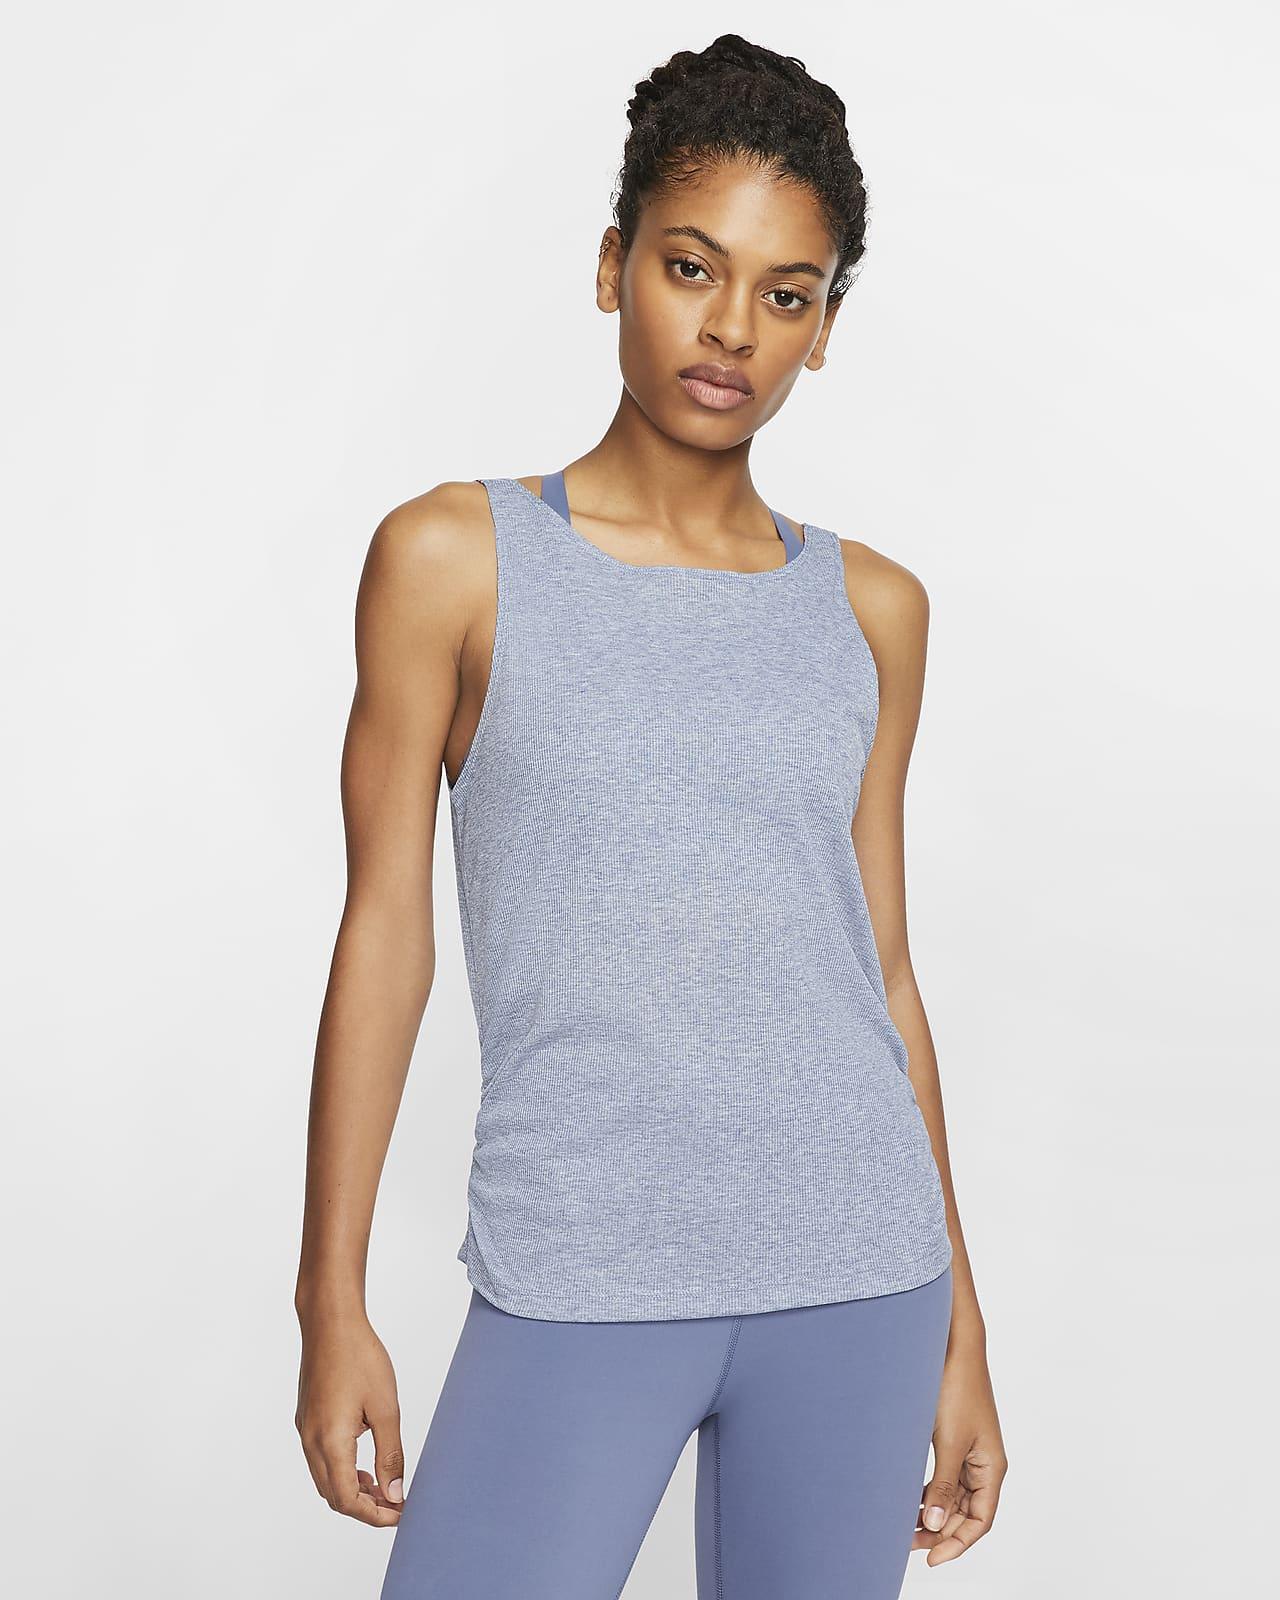 Nike Yoga Women's Ruched Tank